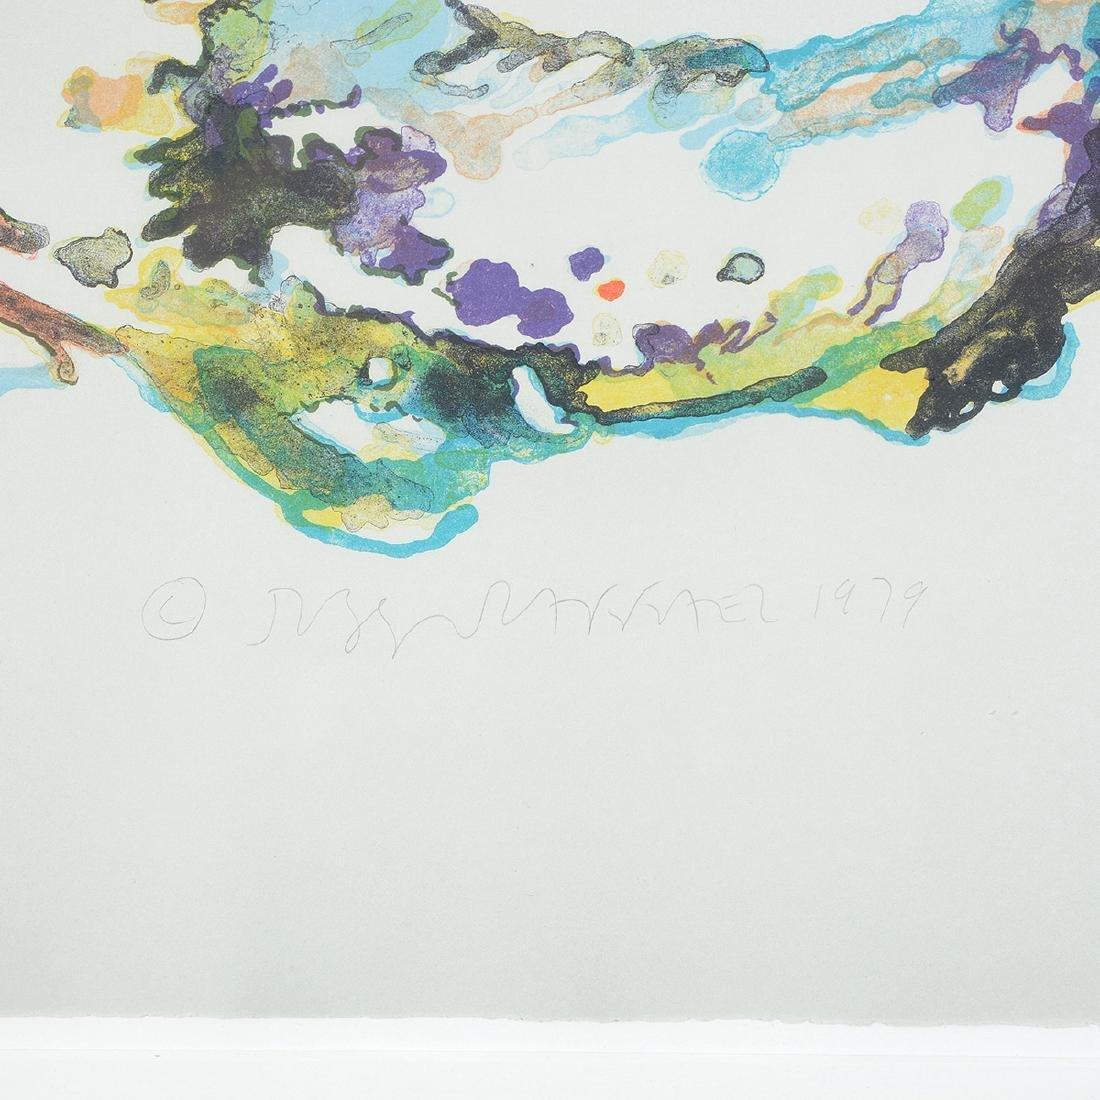 Joseph Raffael, Water lilies & Haiku Fish III lithos - 2